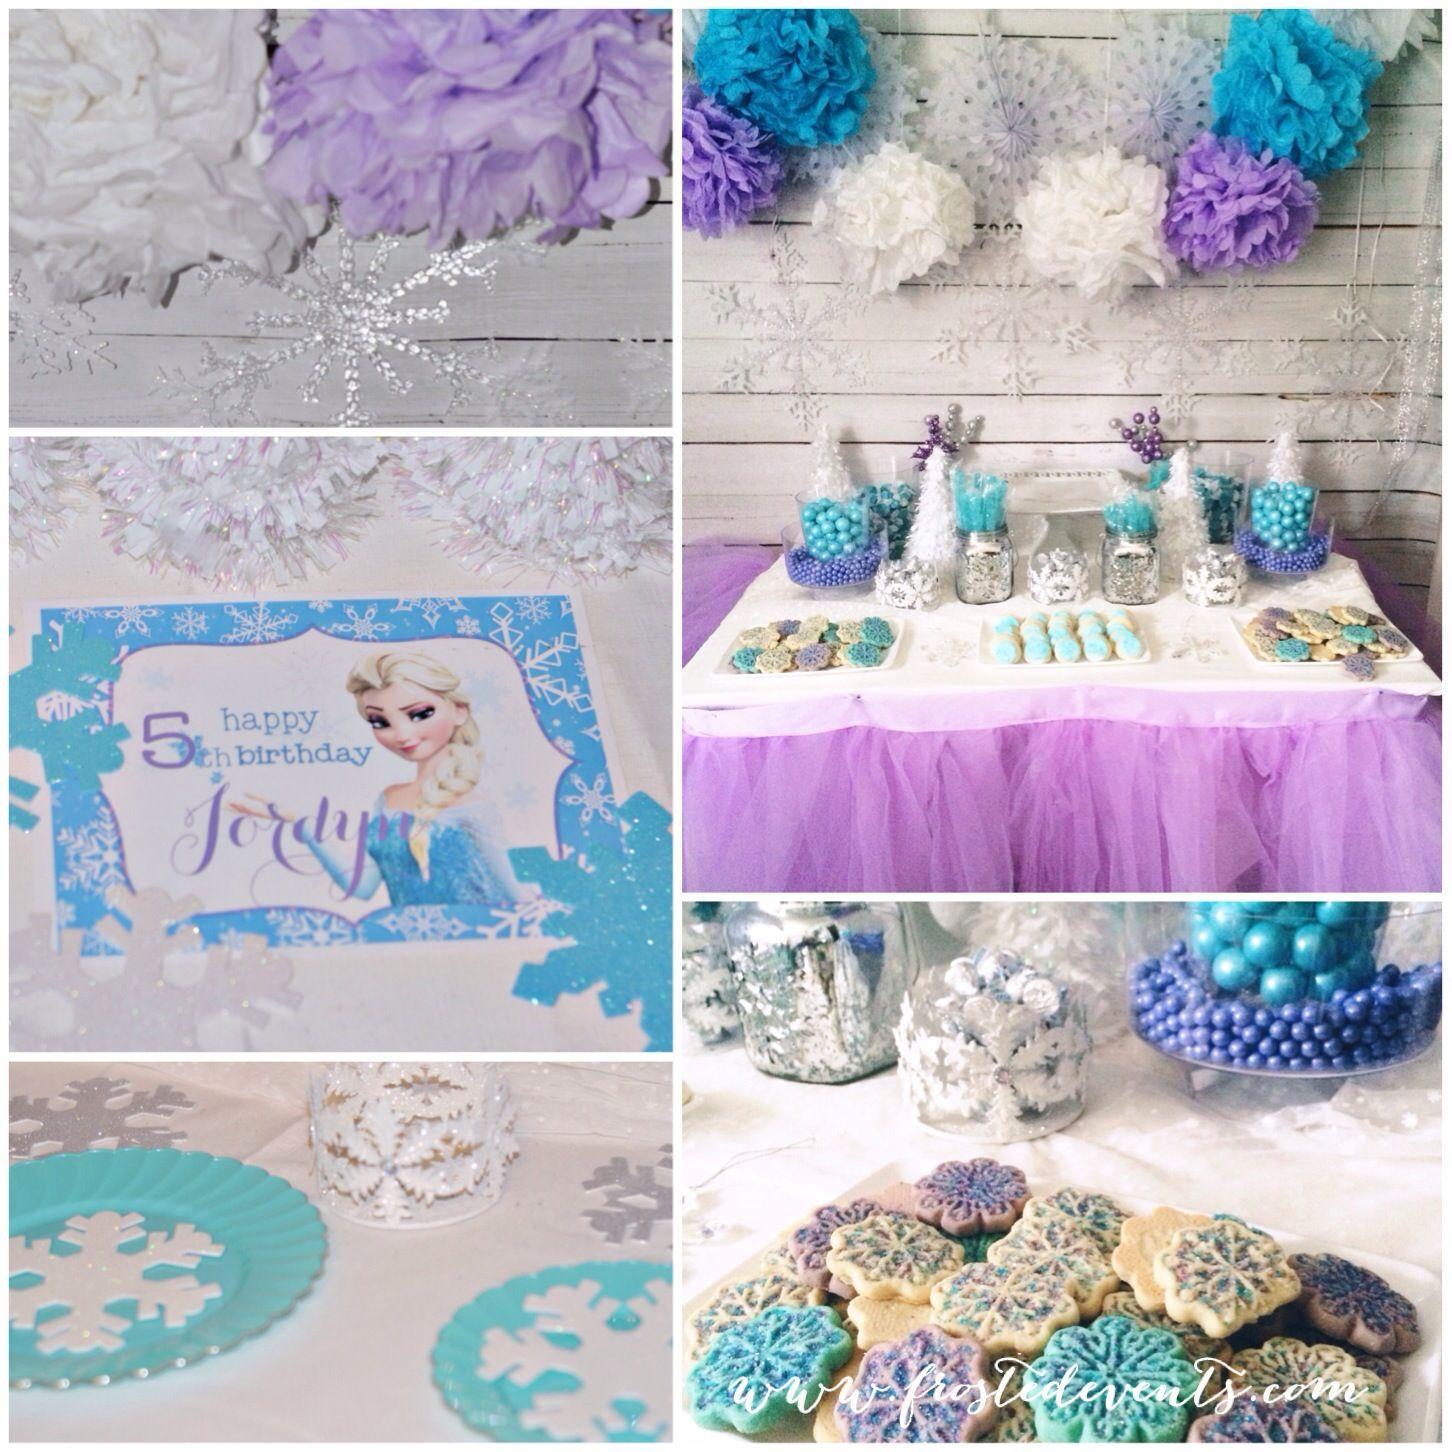 Party Themes Frozen Party Printables Freebie Dessert bars Photo